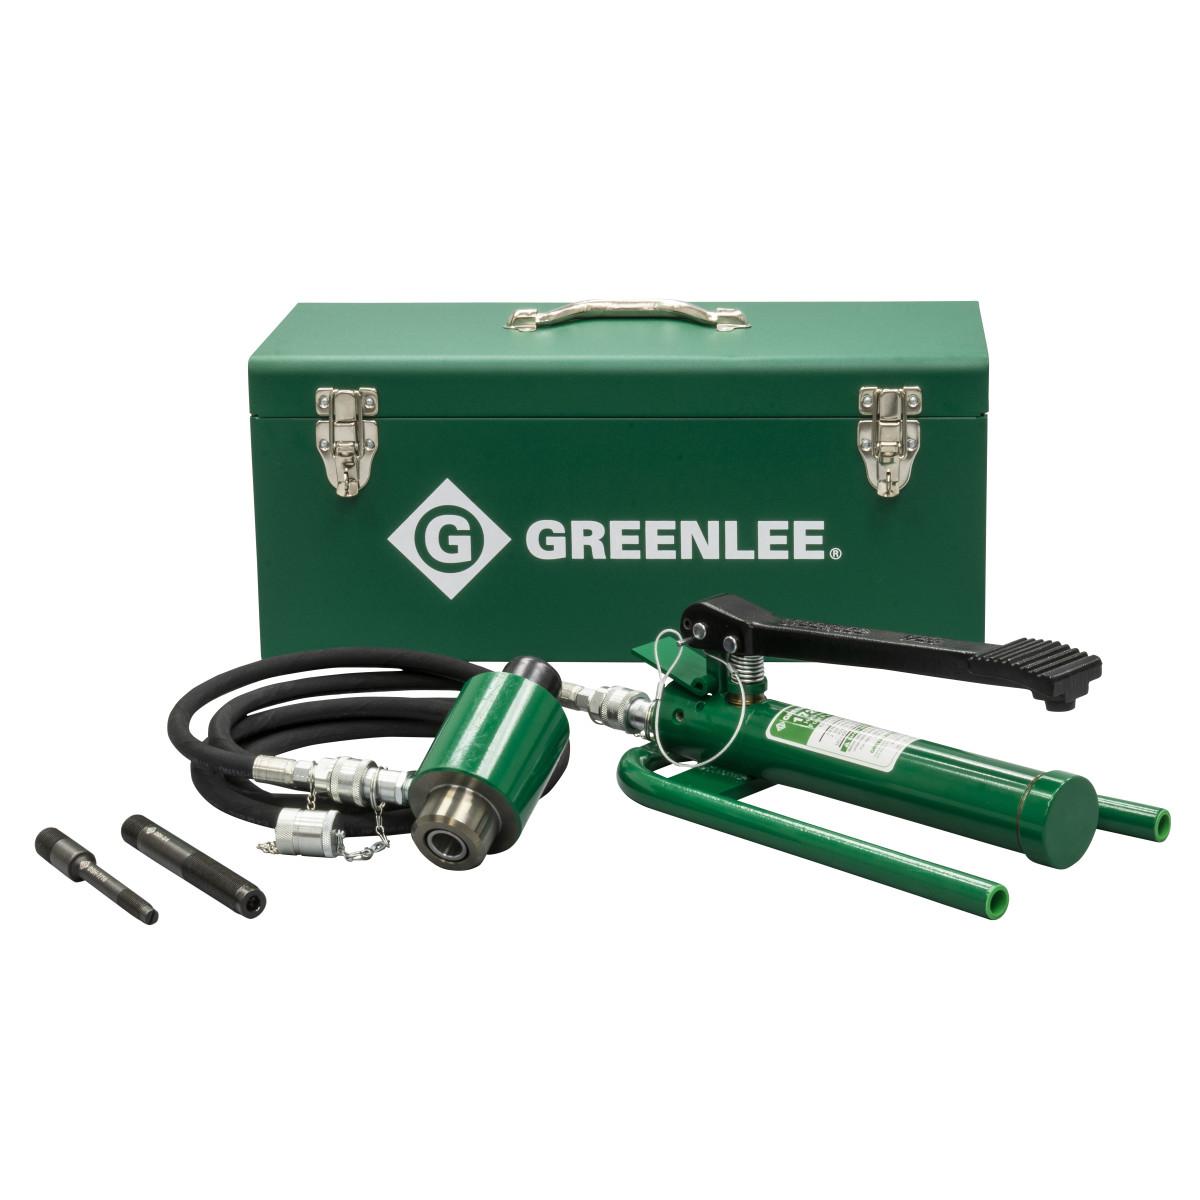 Greenlee 7625 Driver-Punch Hyd Ko (7625)